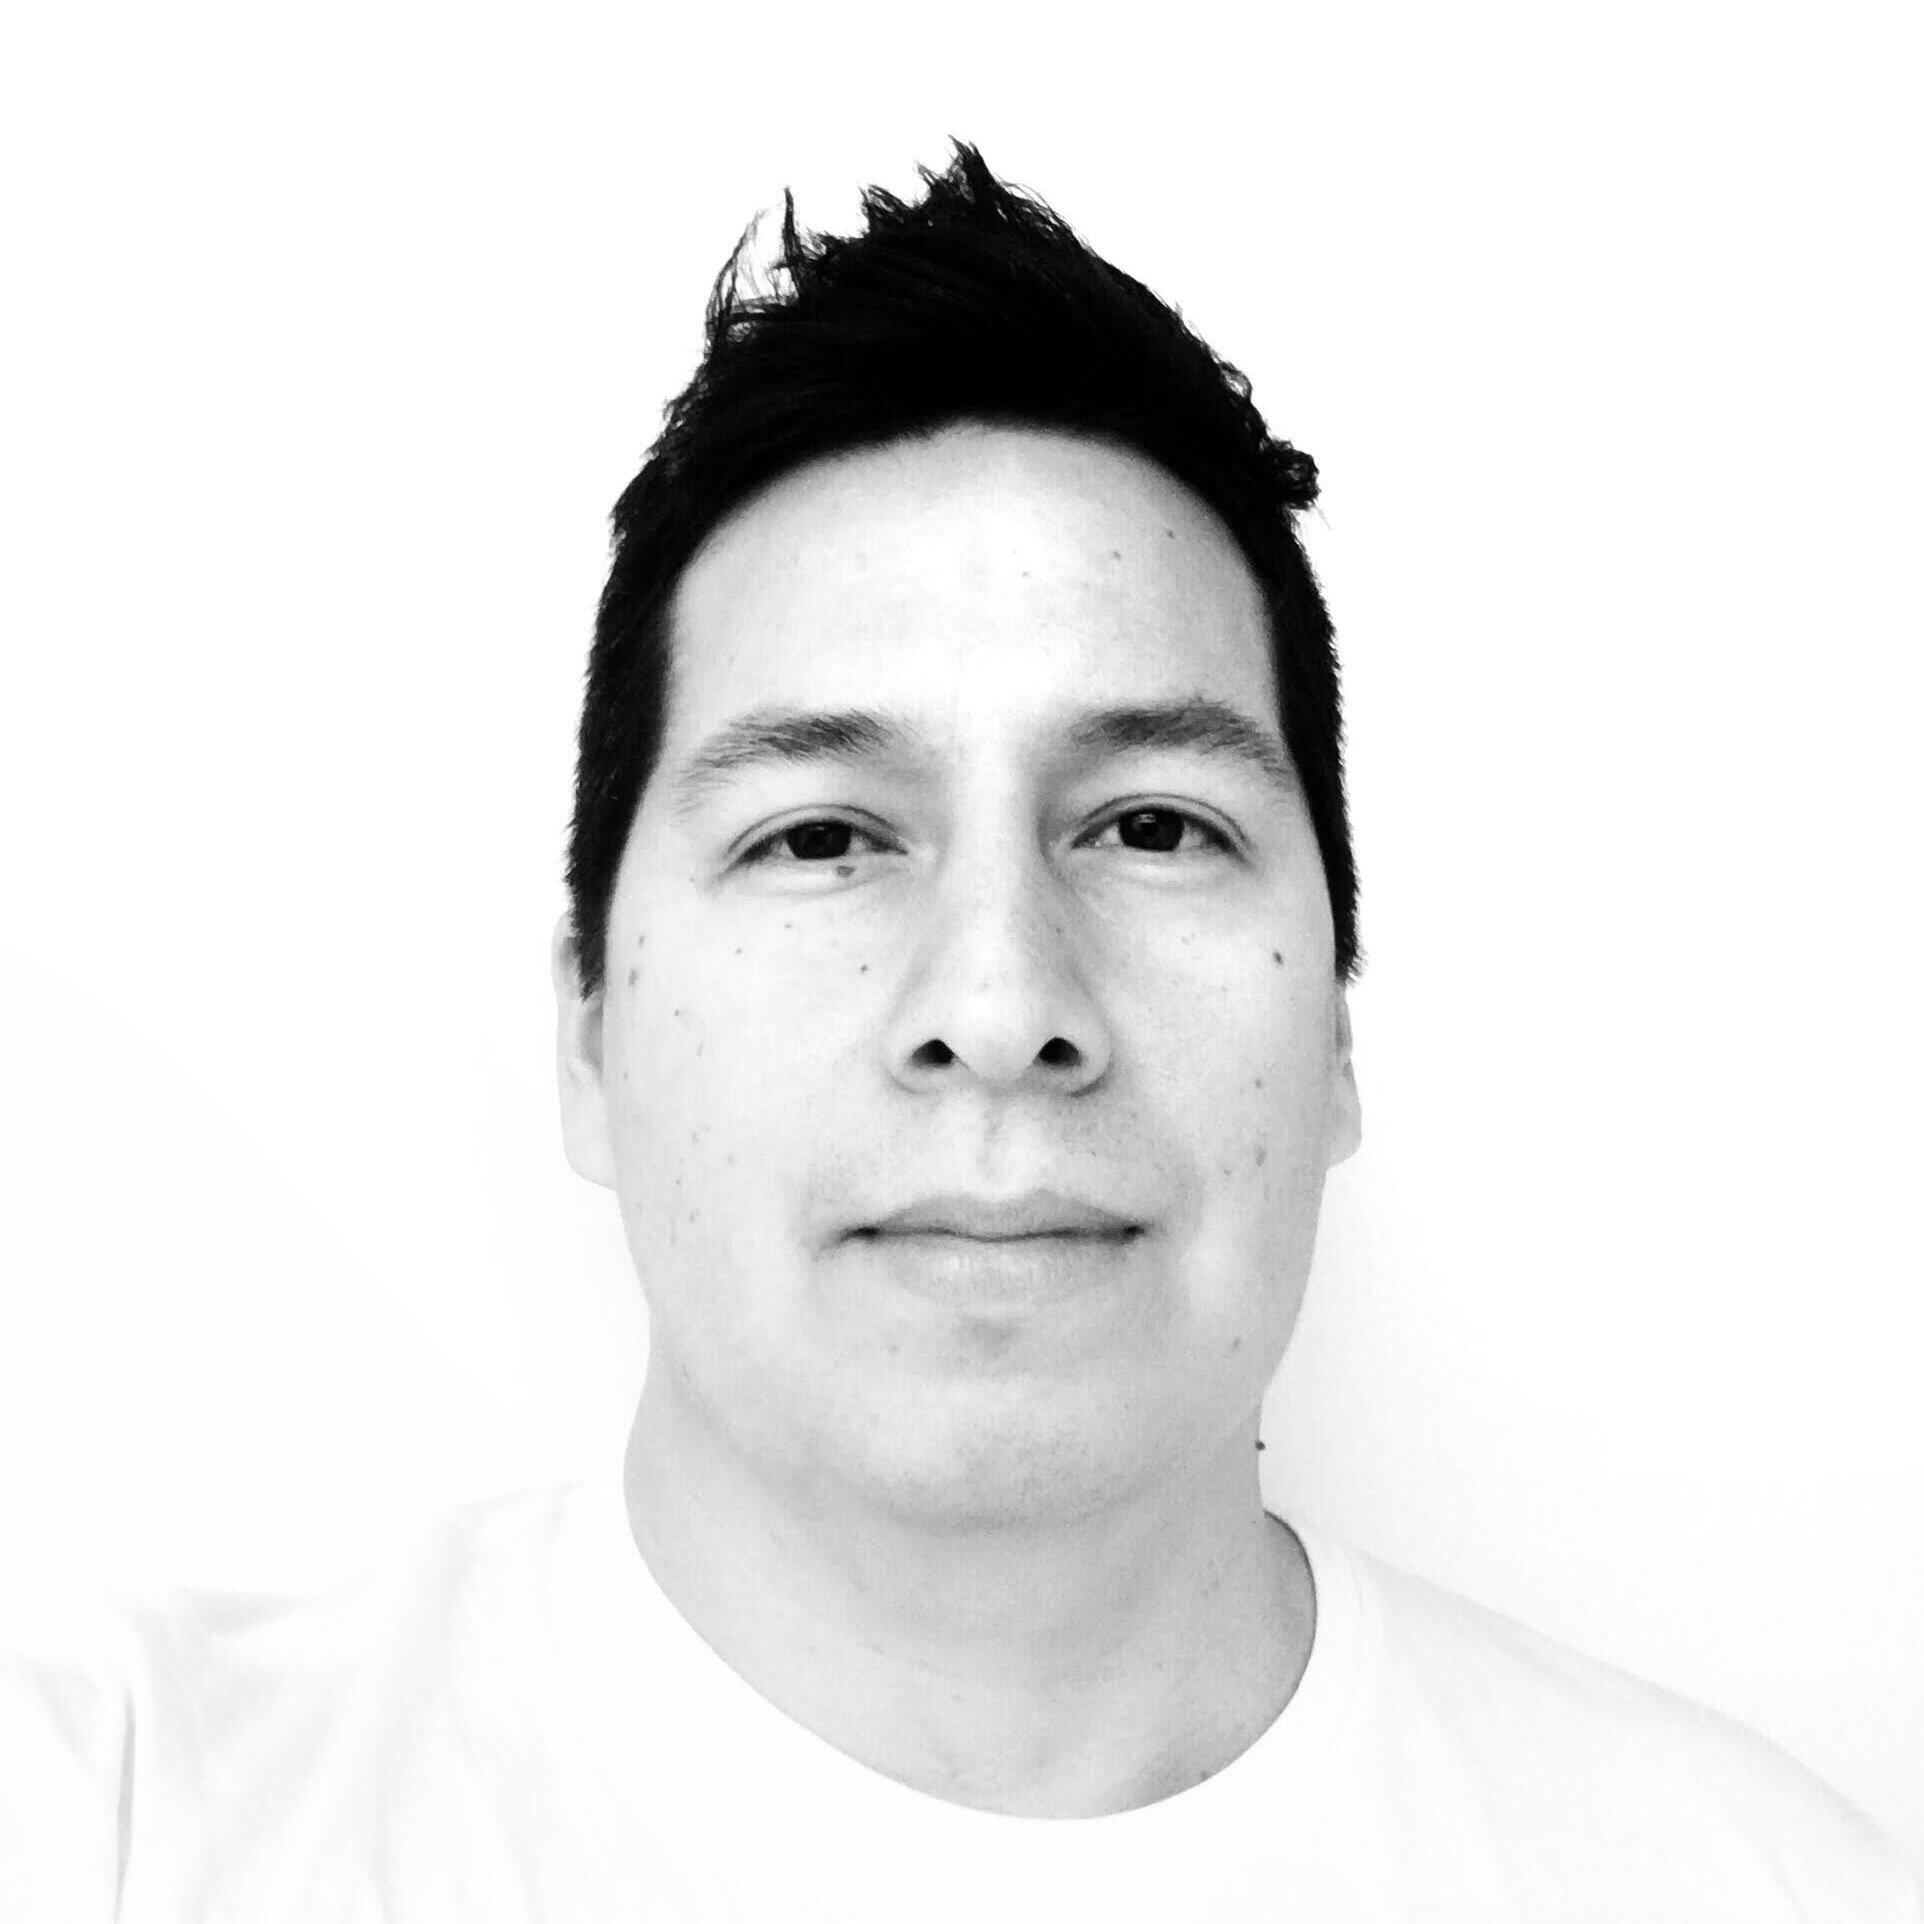 RENZO GRANDE New York, USA / Lima, Peru @EverydayPeru  renzogrande.com   @renzogrande